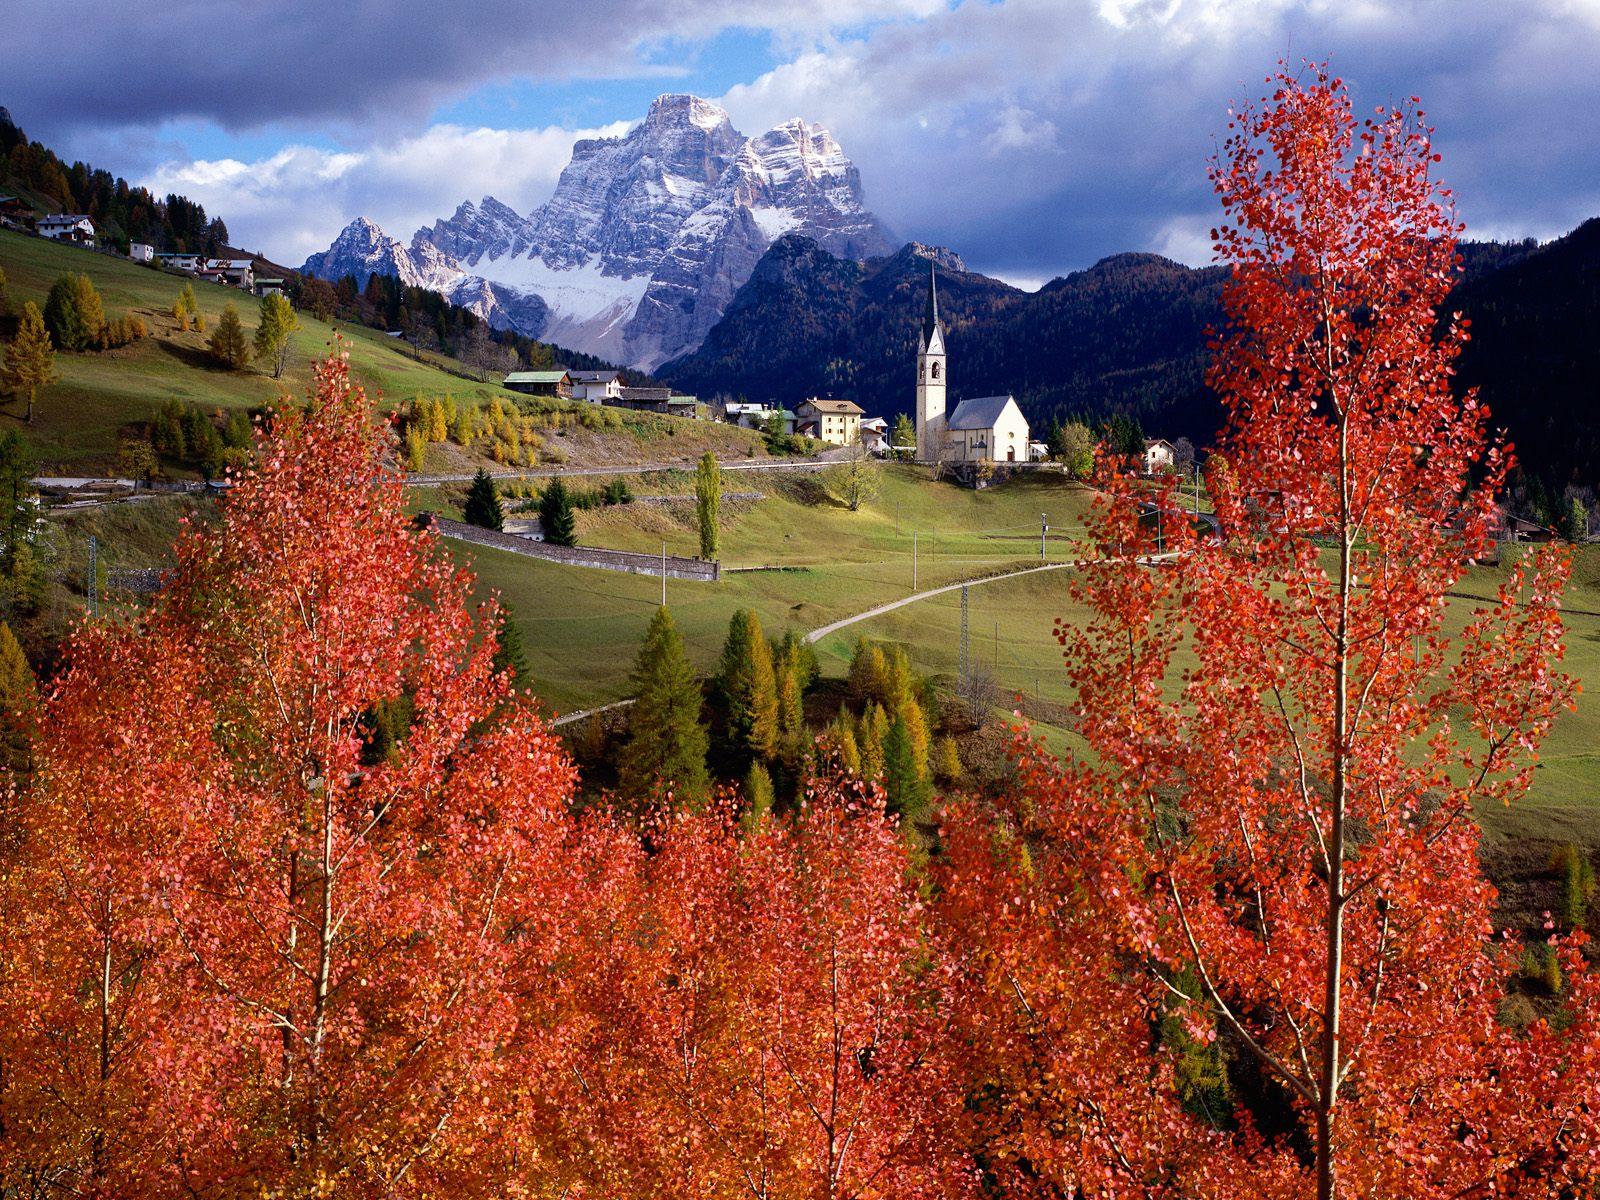 http://1.bp.blogspot.com/-ZnTkLa0mU7U/Tcp3KHl8euI/AAAAAAAACWs/iMBLnc2ObZ0/s1600/Church+of+Selva+Di+Cadore%252C+Colle+Santa+Lucia%252C+Italy.jpg